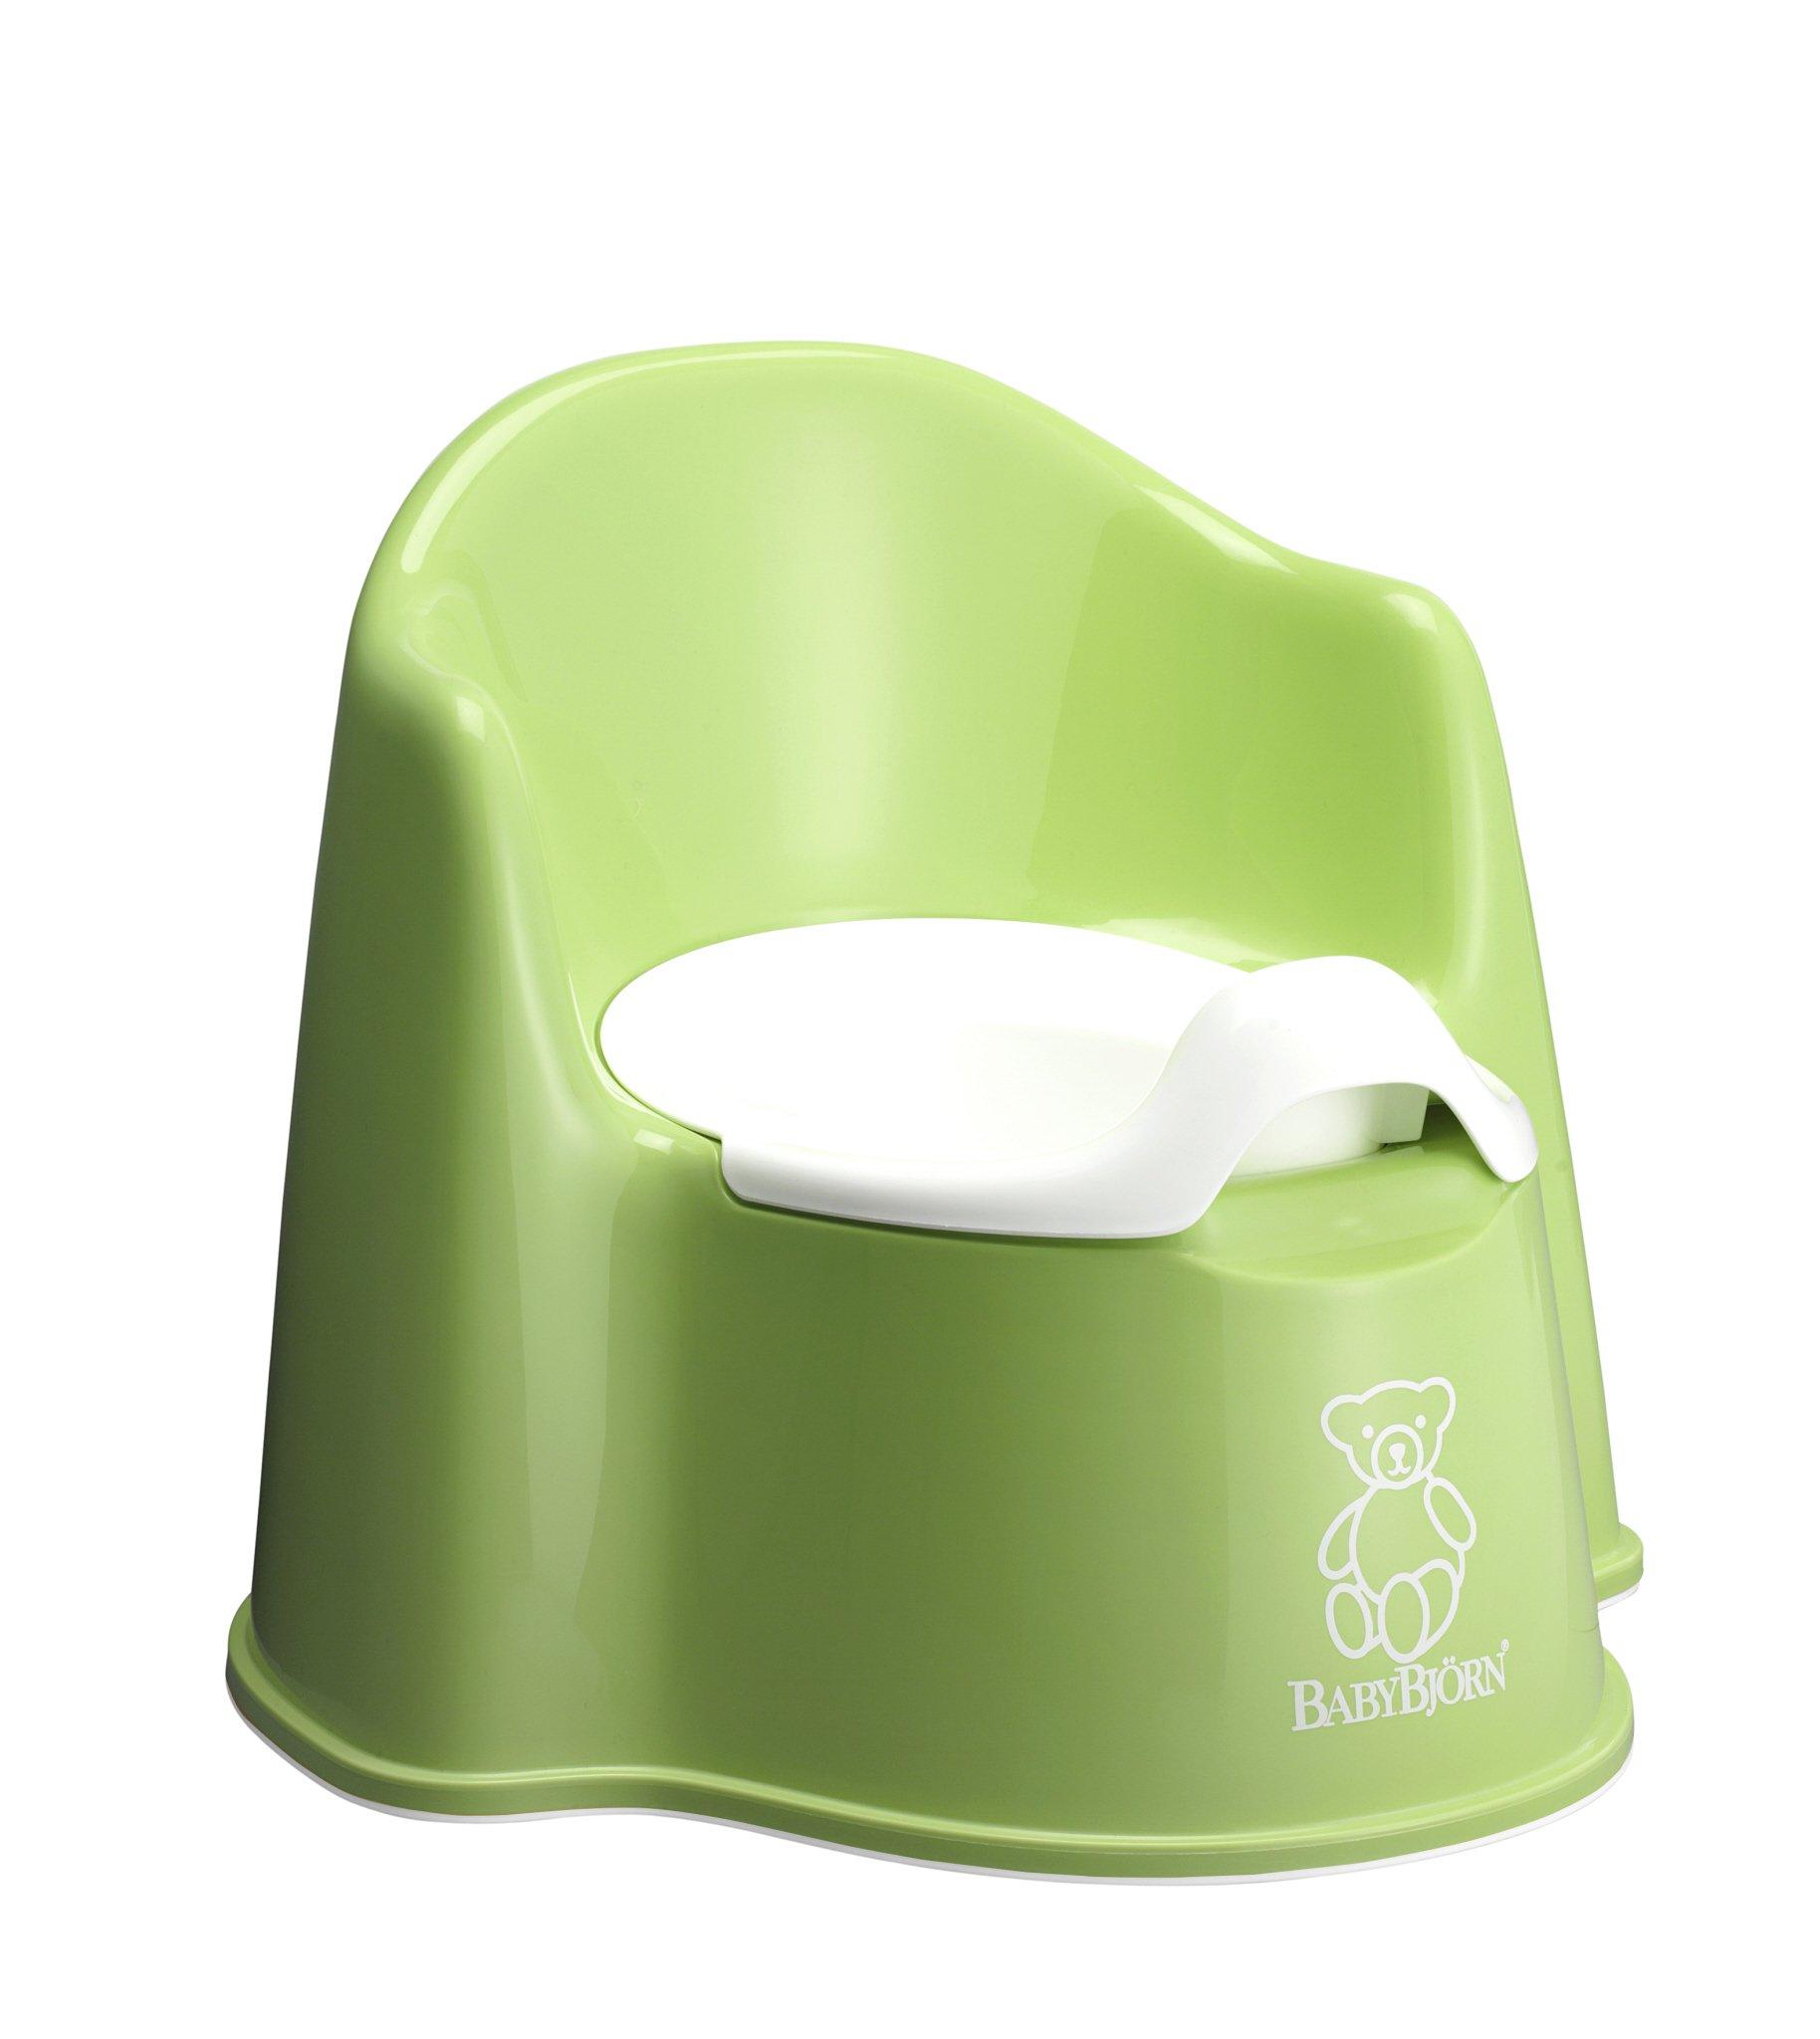 BABYBJORN Potty Chair, Green/White